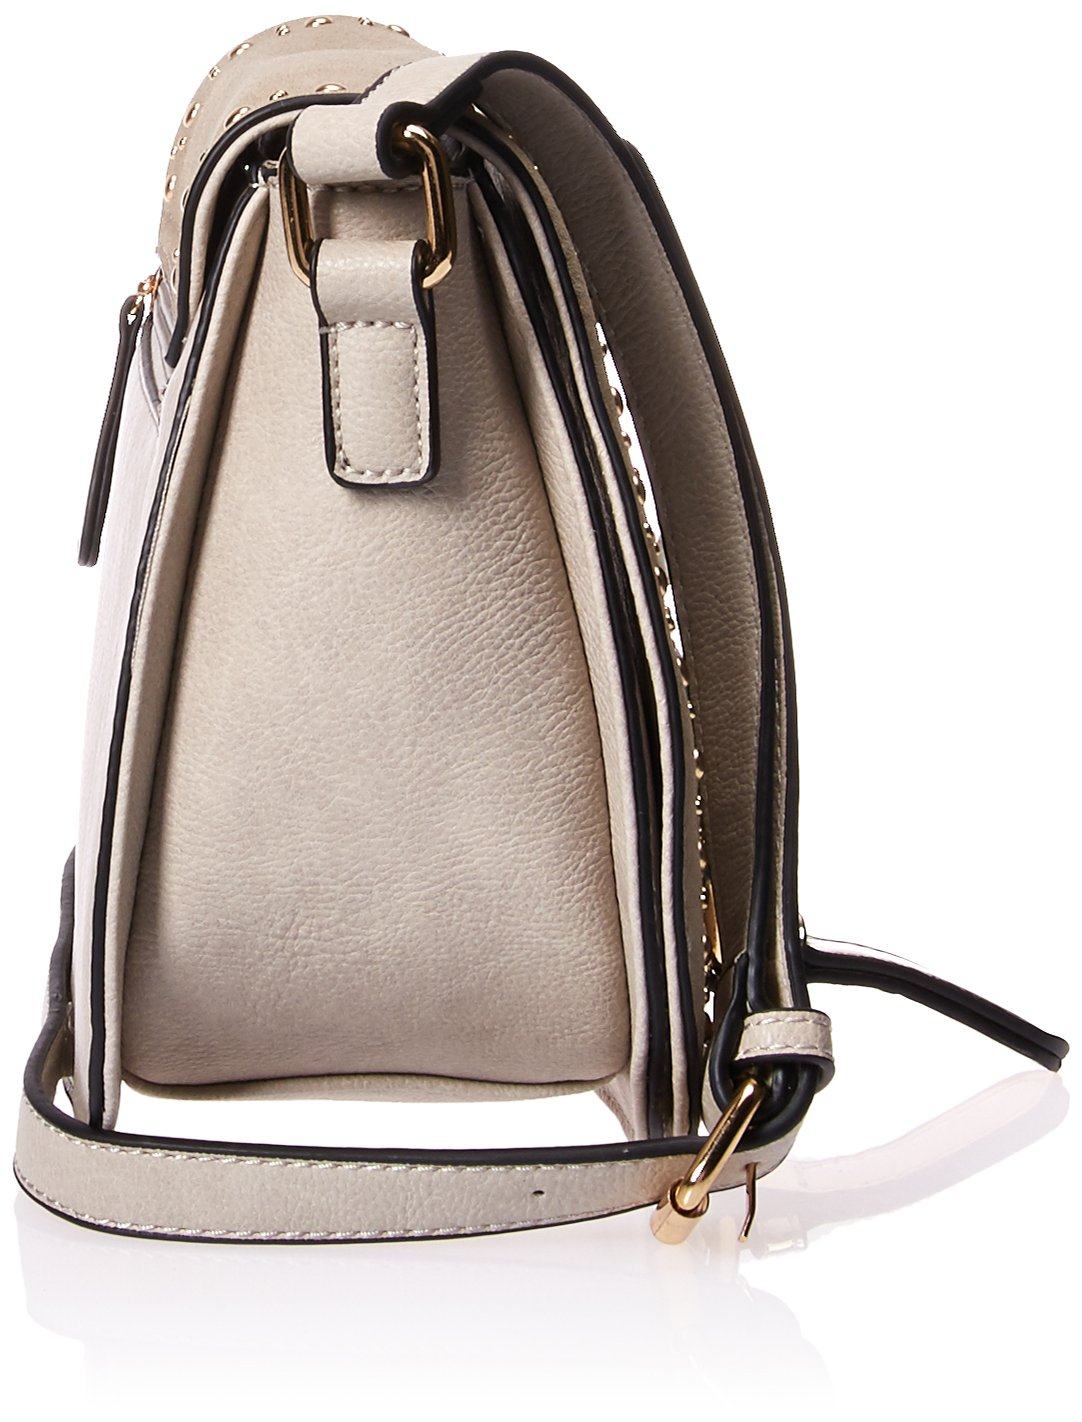 Nikky Womens Studded Soft Eco-Leather Gray Crossbody Cross Body Bag One Size